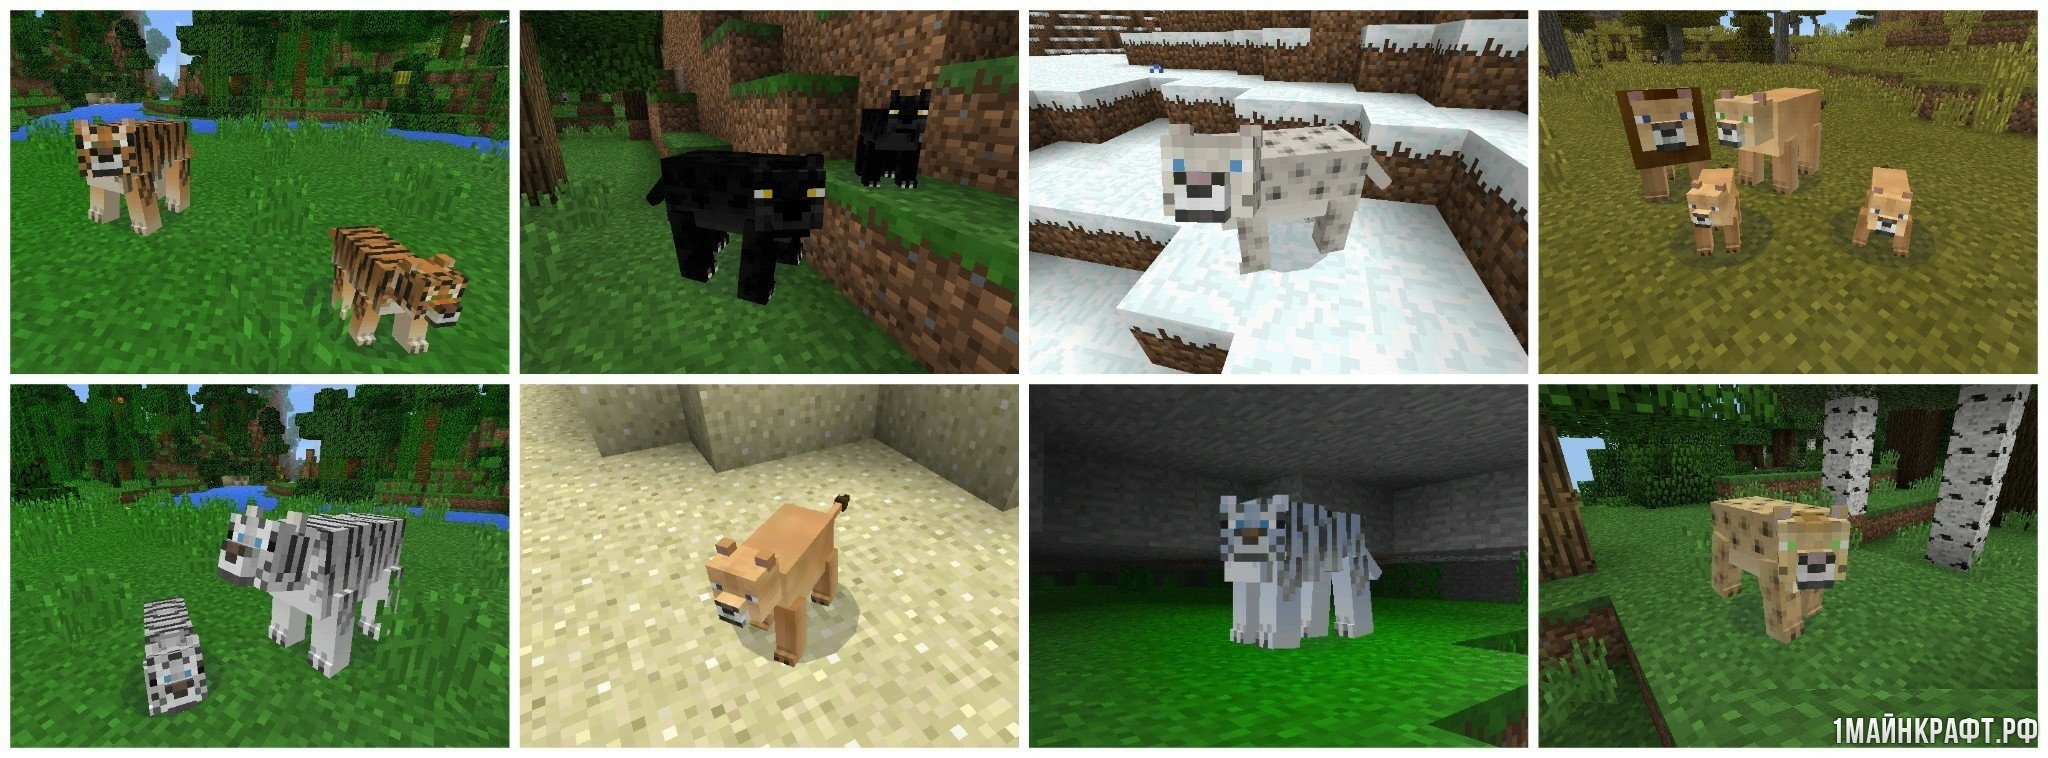 моды для майнкрафт 1.7.2 на домашних животных